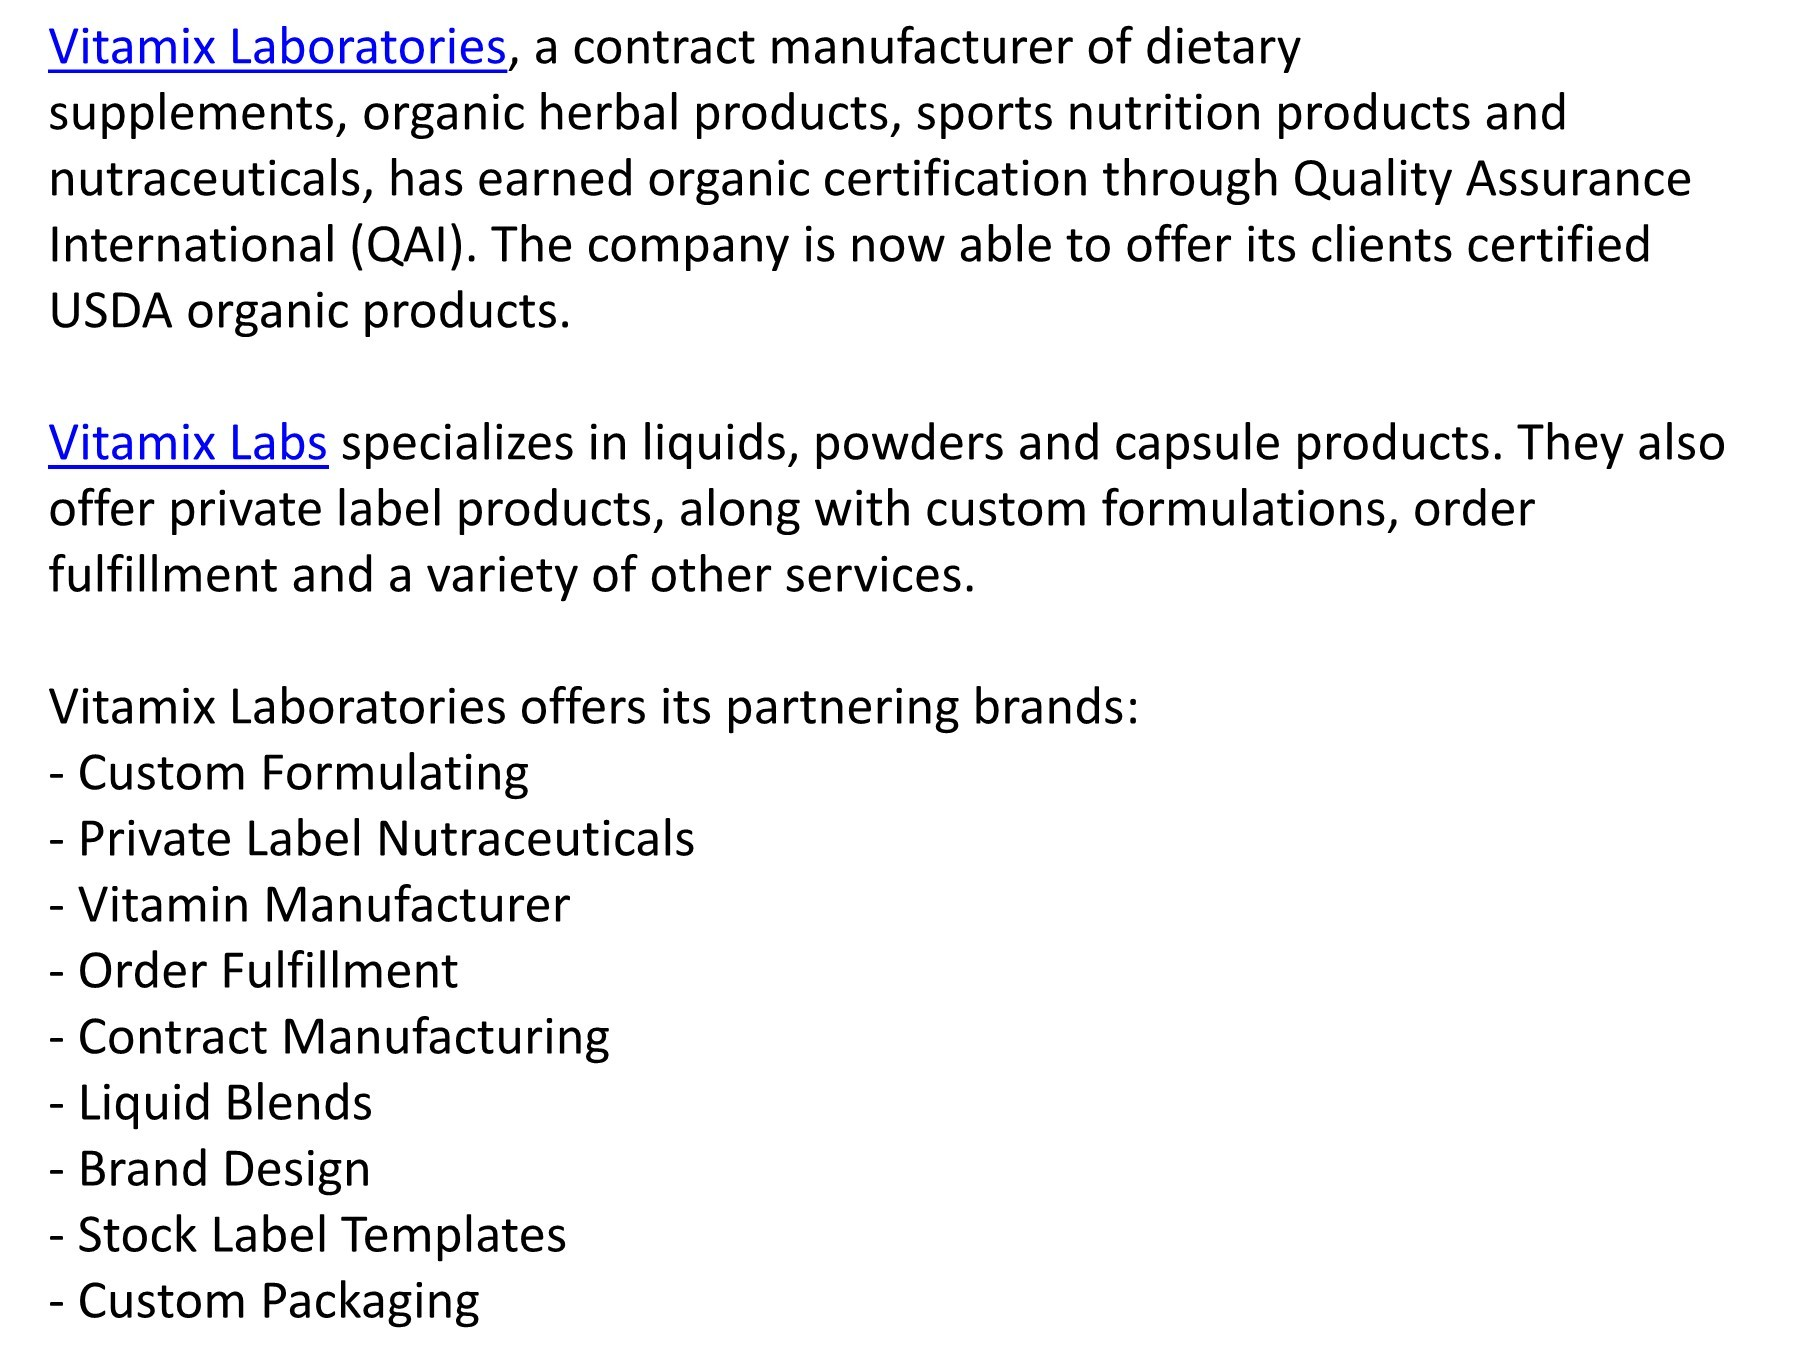 Vitamix Laboratories Earns Organic Facility Certification   PubHTML5